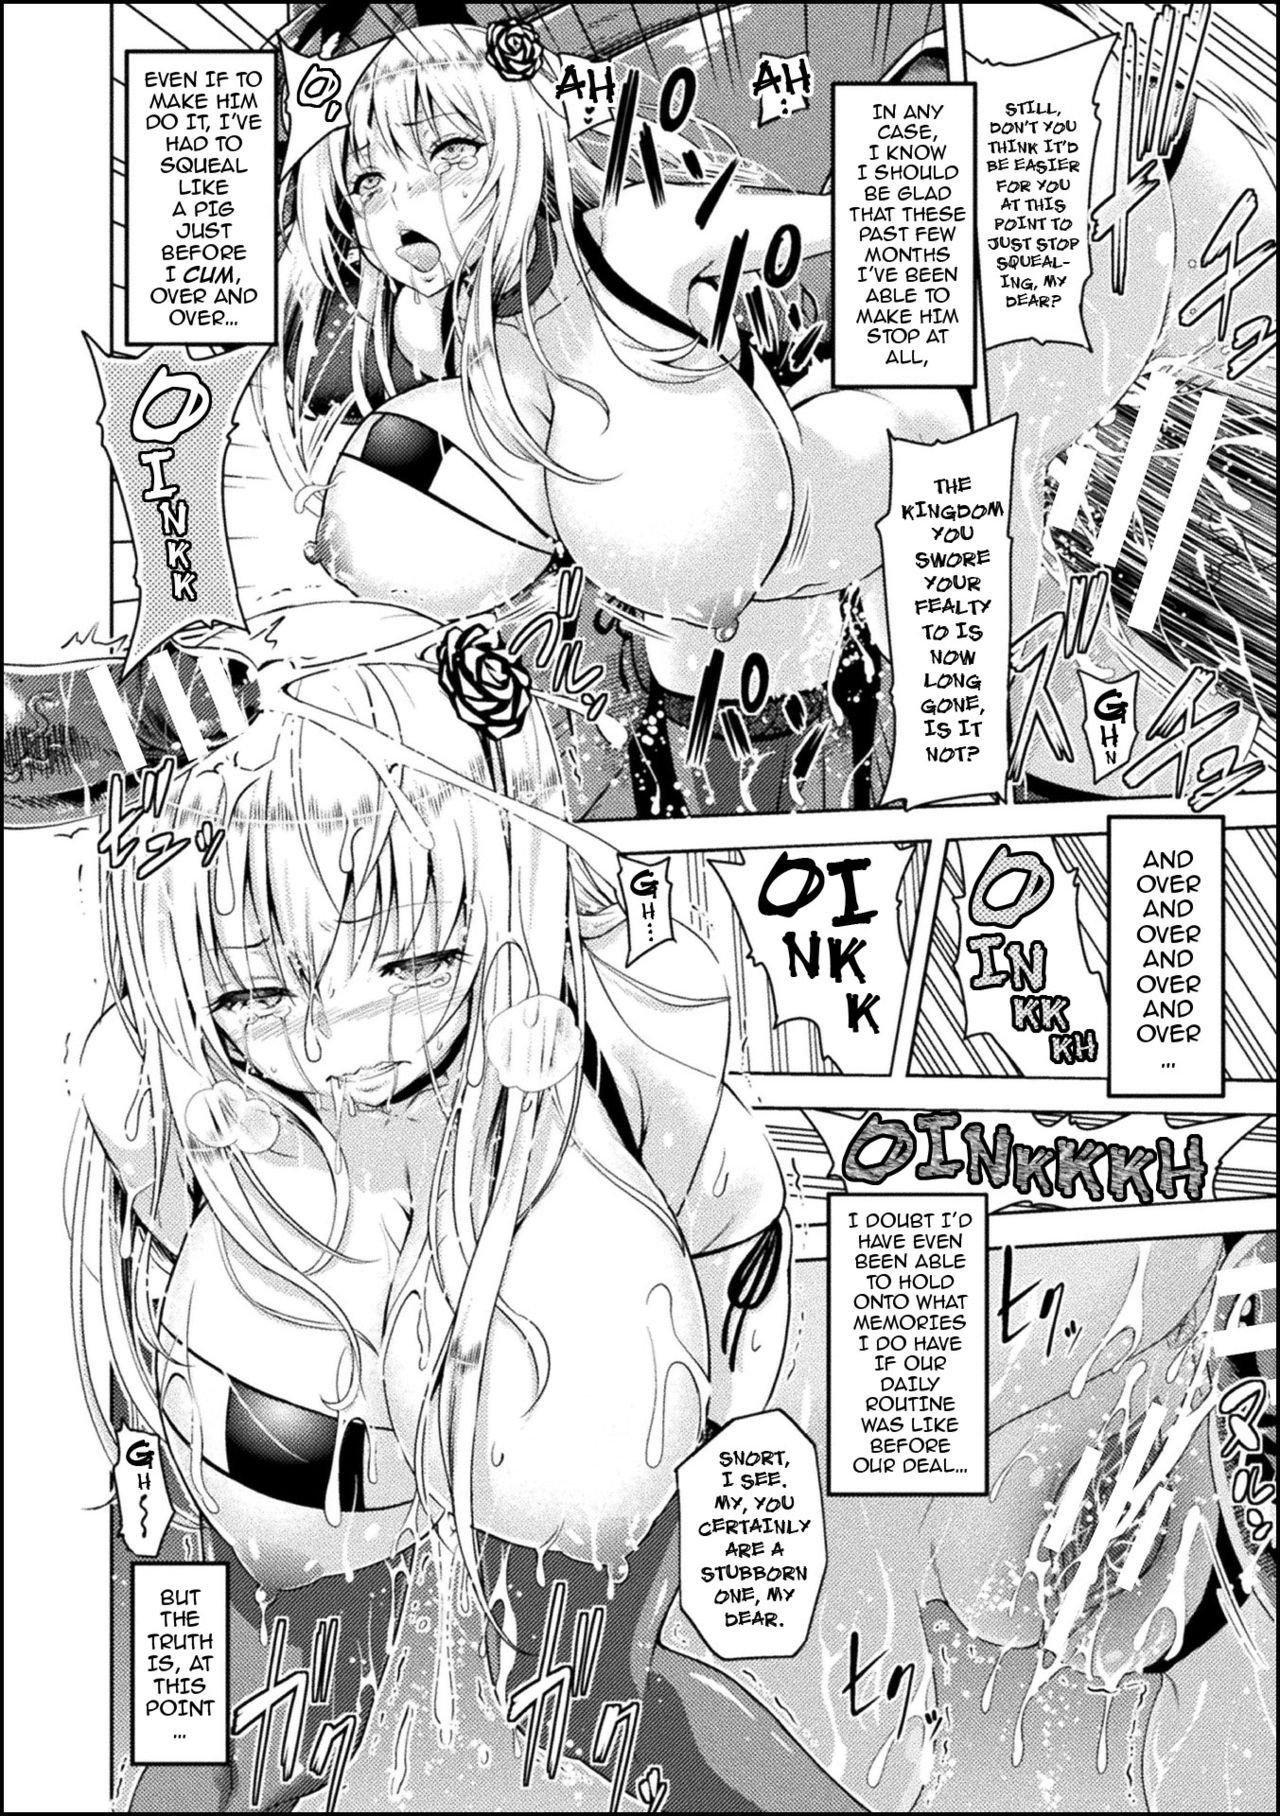 [Yamada Gogogo] Erona ~Orc no Inmon ni Okasareta Onna Kishi no Matsuro~ | Erona ~The Fall of a Beautiful Knight Cursed with the Lewd Mark of an Orc~ Ch. 1-3 [English] {darknight} 56